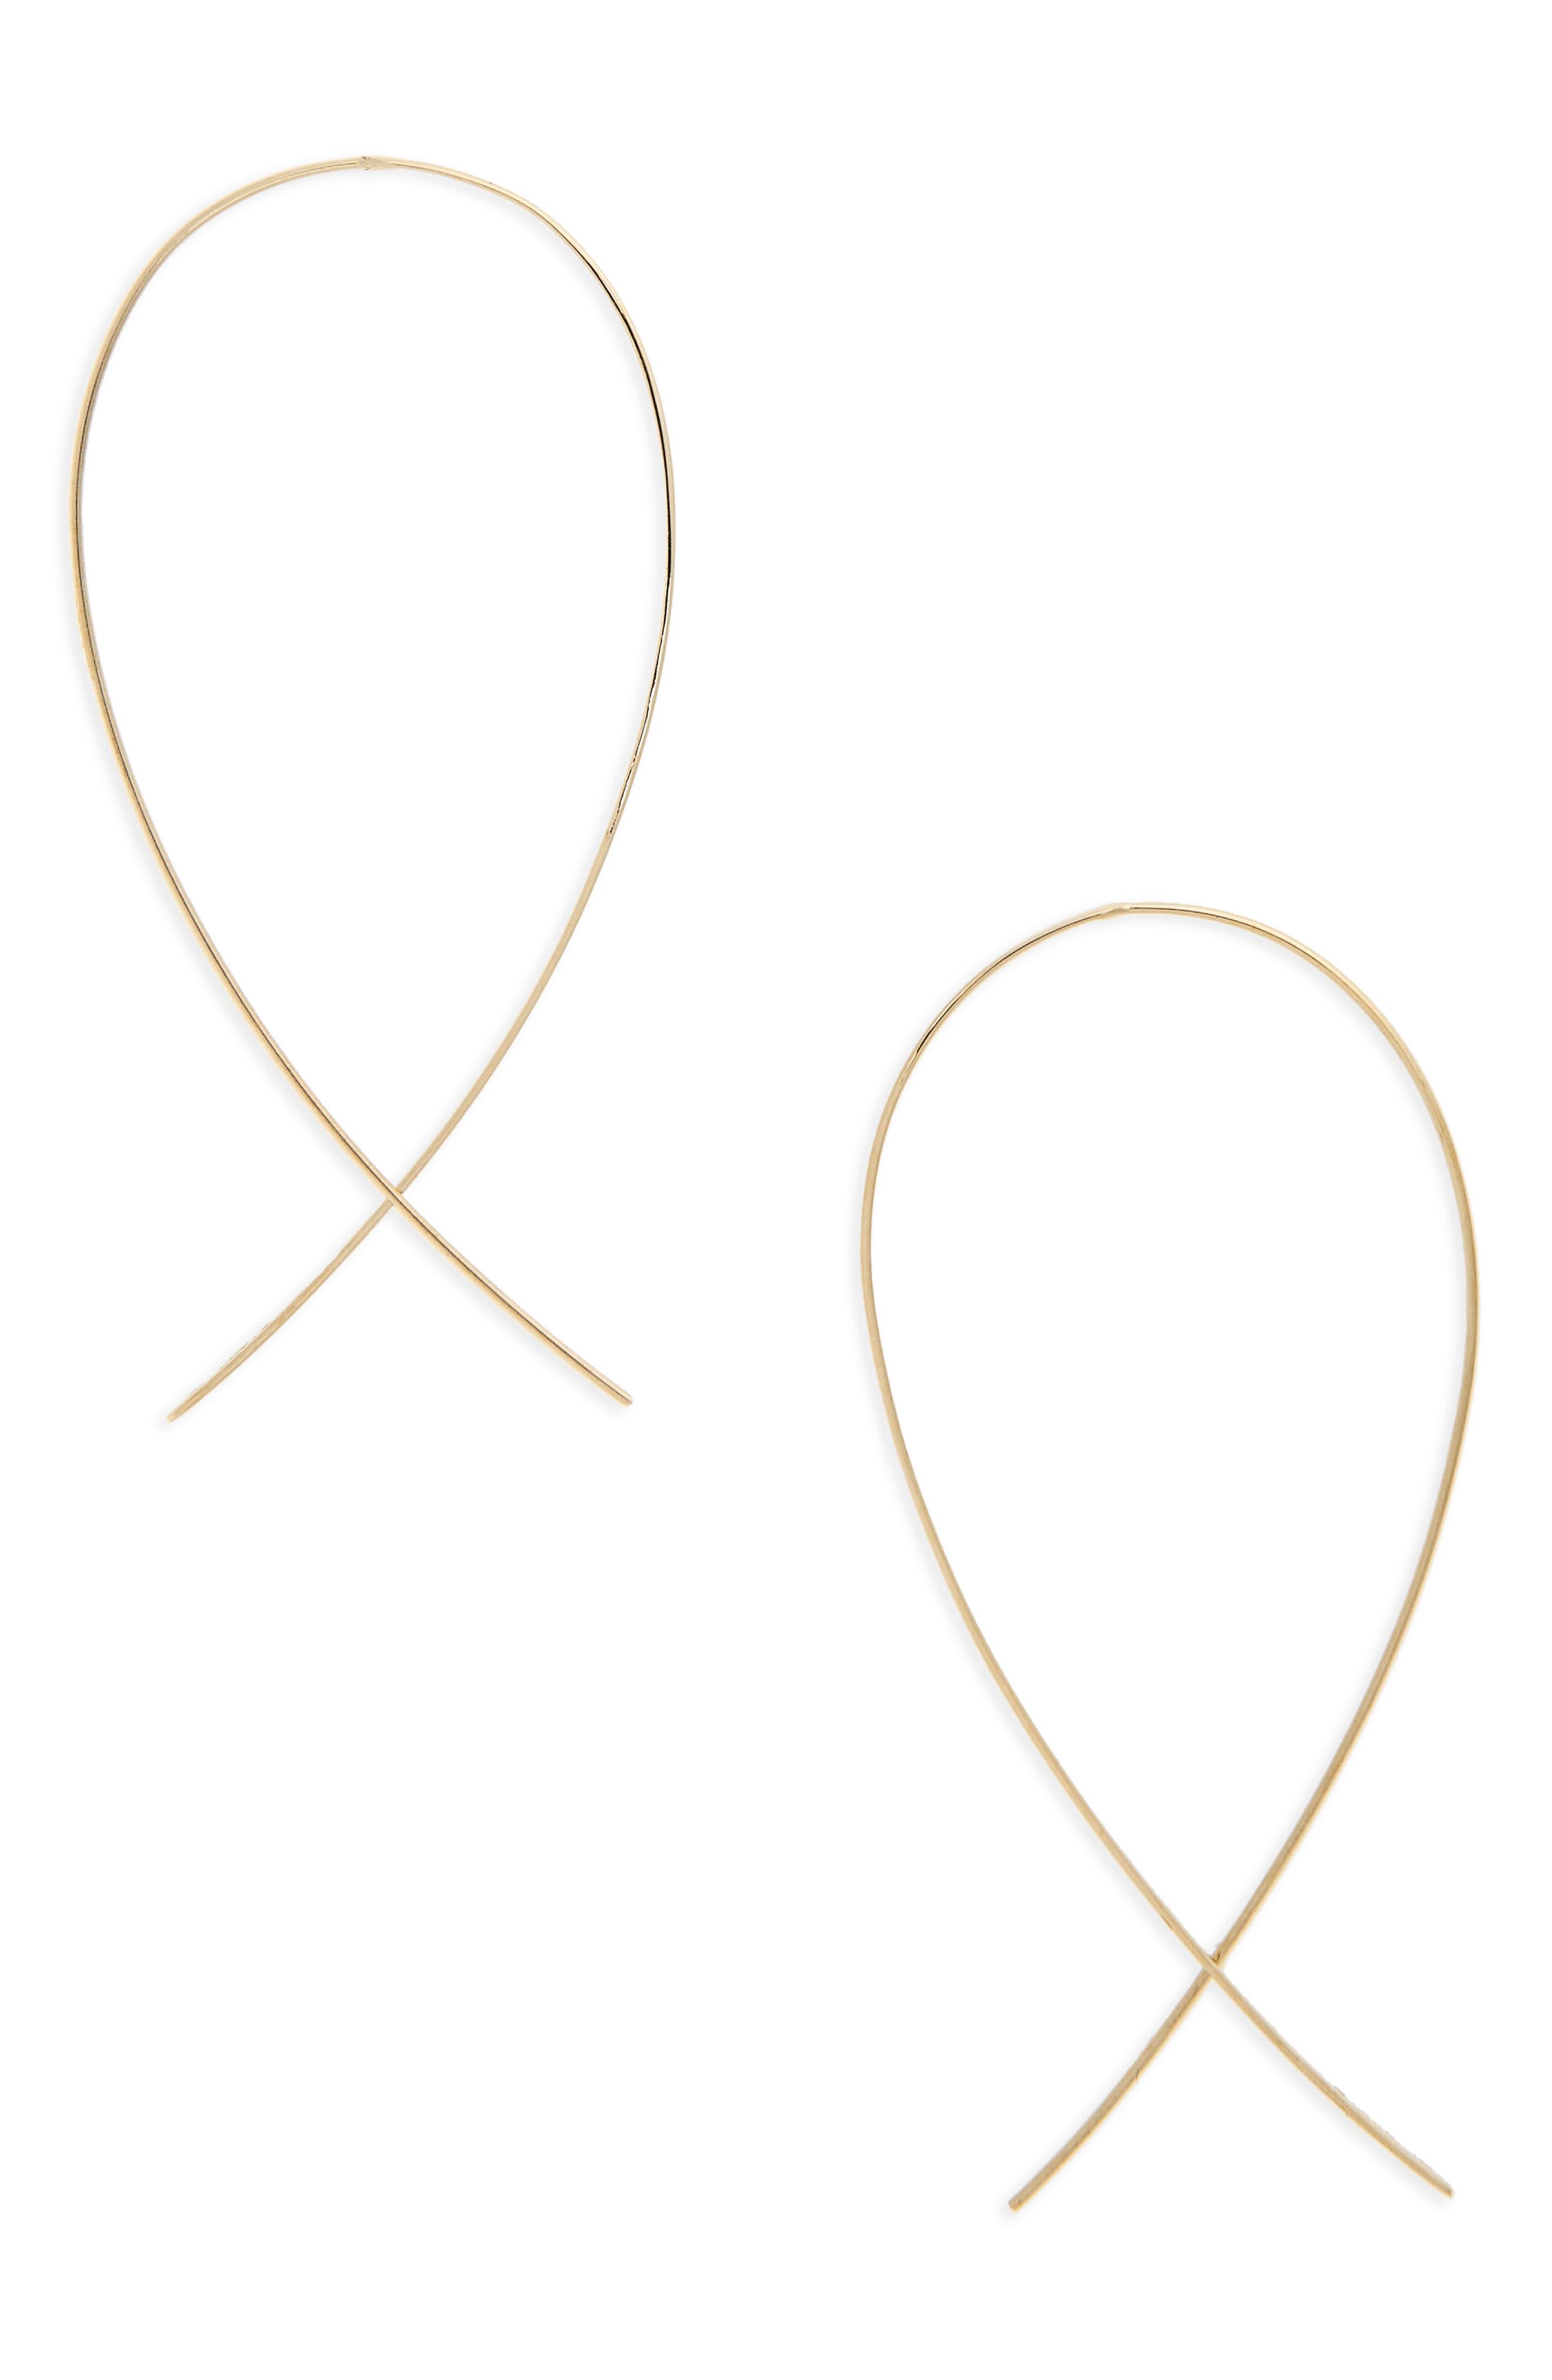 Medium Upside Down Hoop Earrings,                             Main thumbnail 1, color,                             YELLOW GOLD